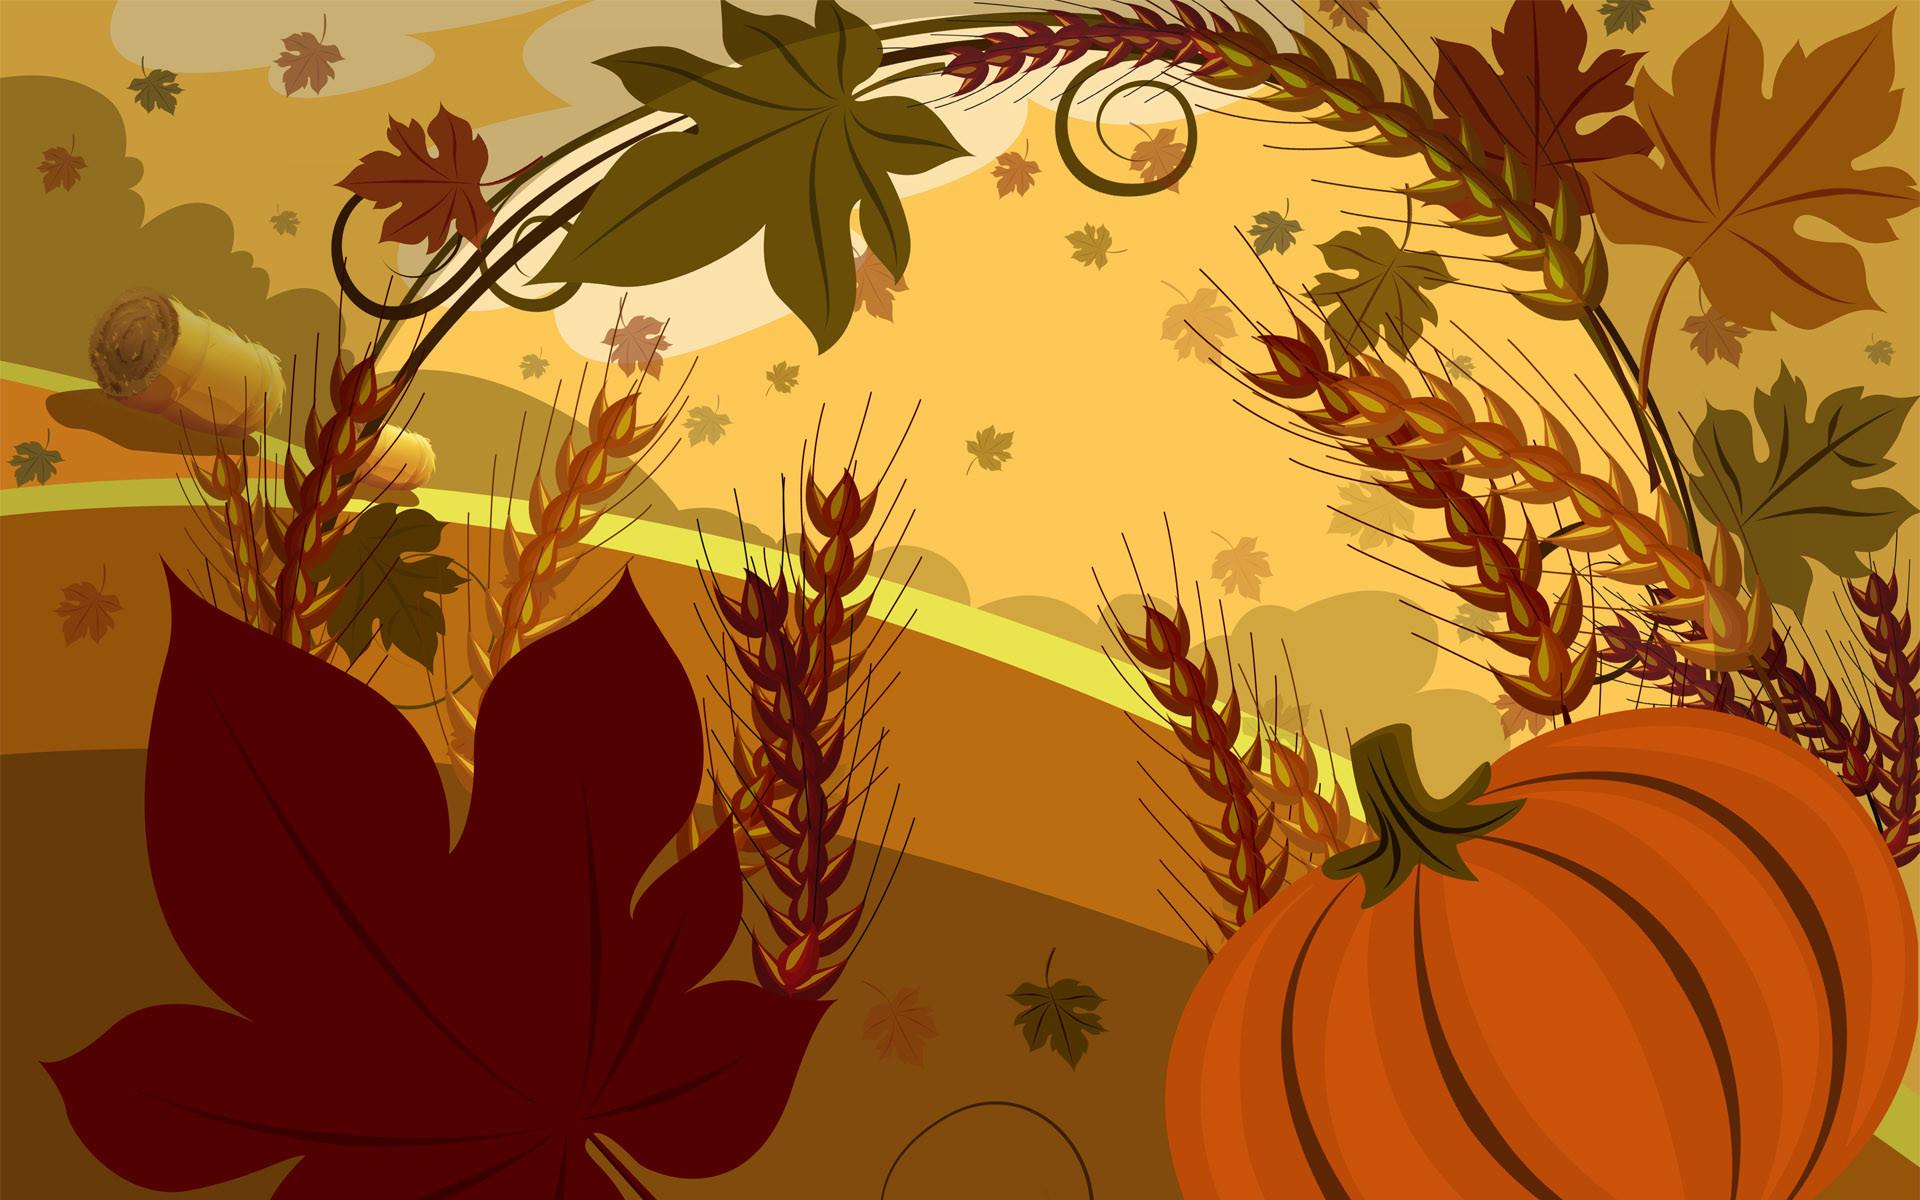 1920x1200 Free Desktop Wallpapers Thanksgiving Wallpaper